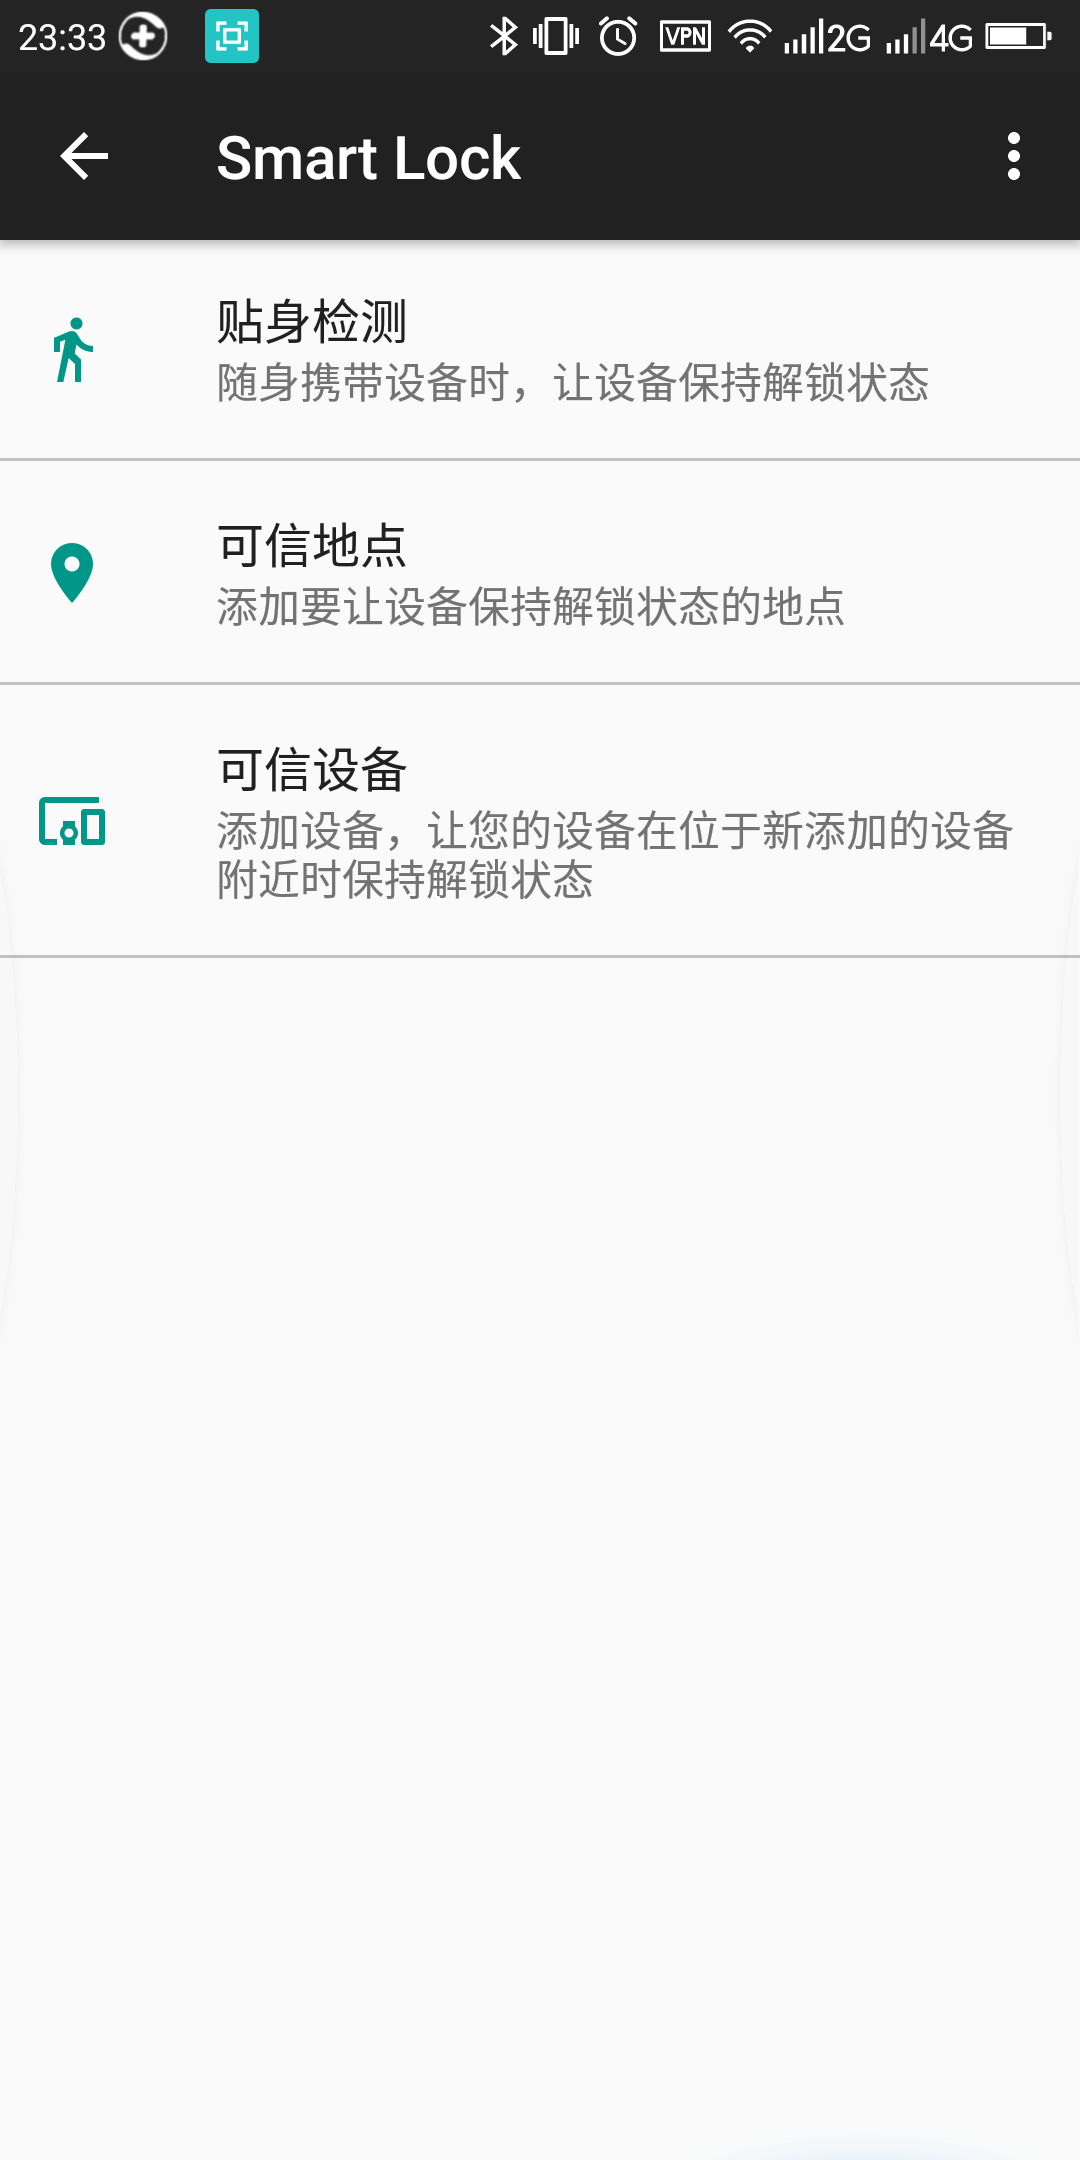 Screenshot_2018-12-27-23-34-00.png